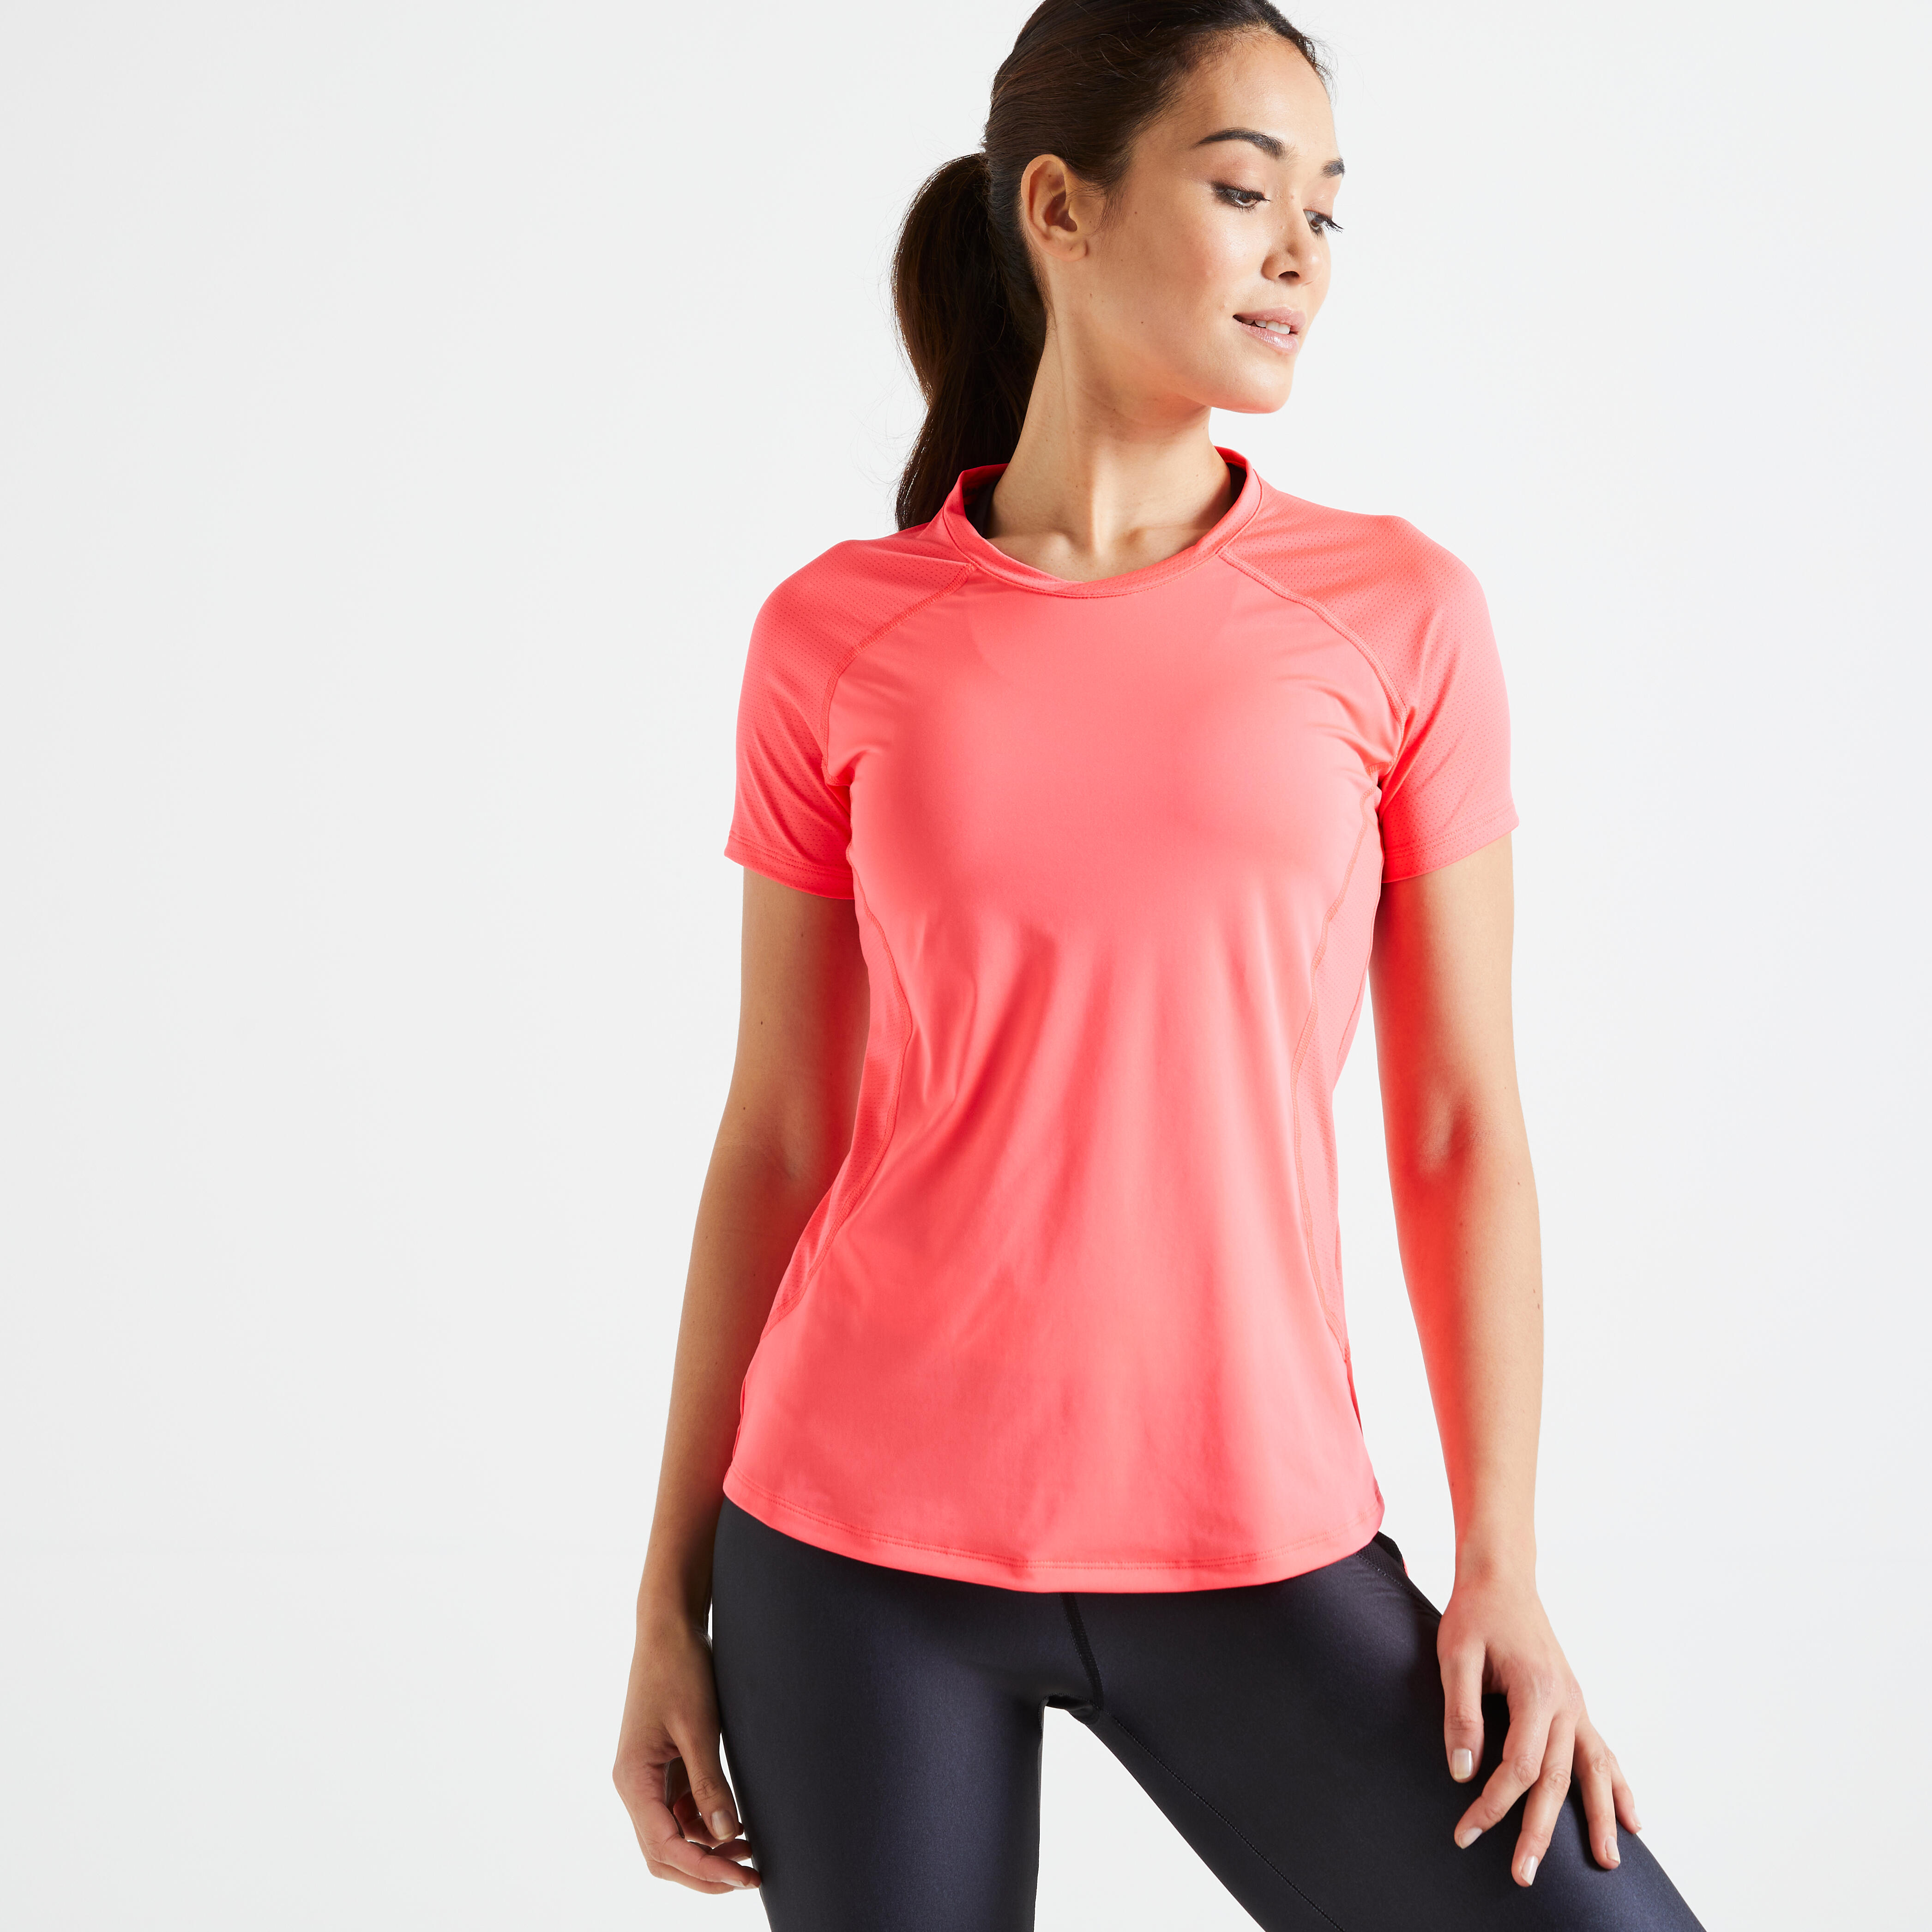 Tricou Fitness FTA521 Damă la Reducere poza